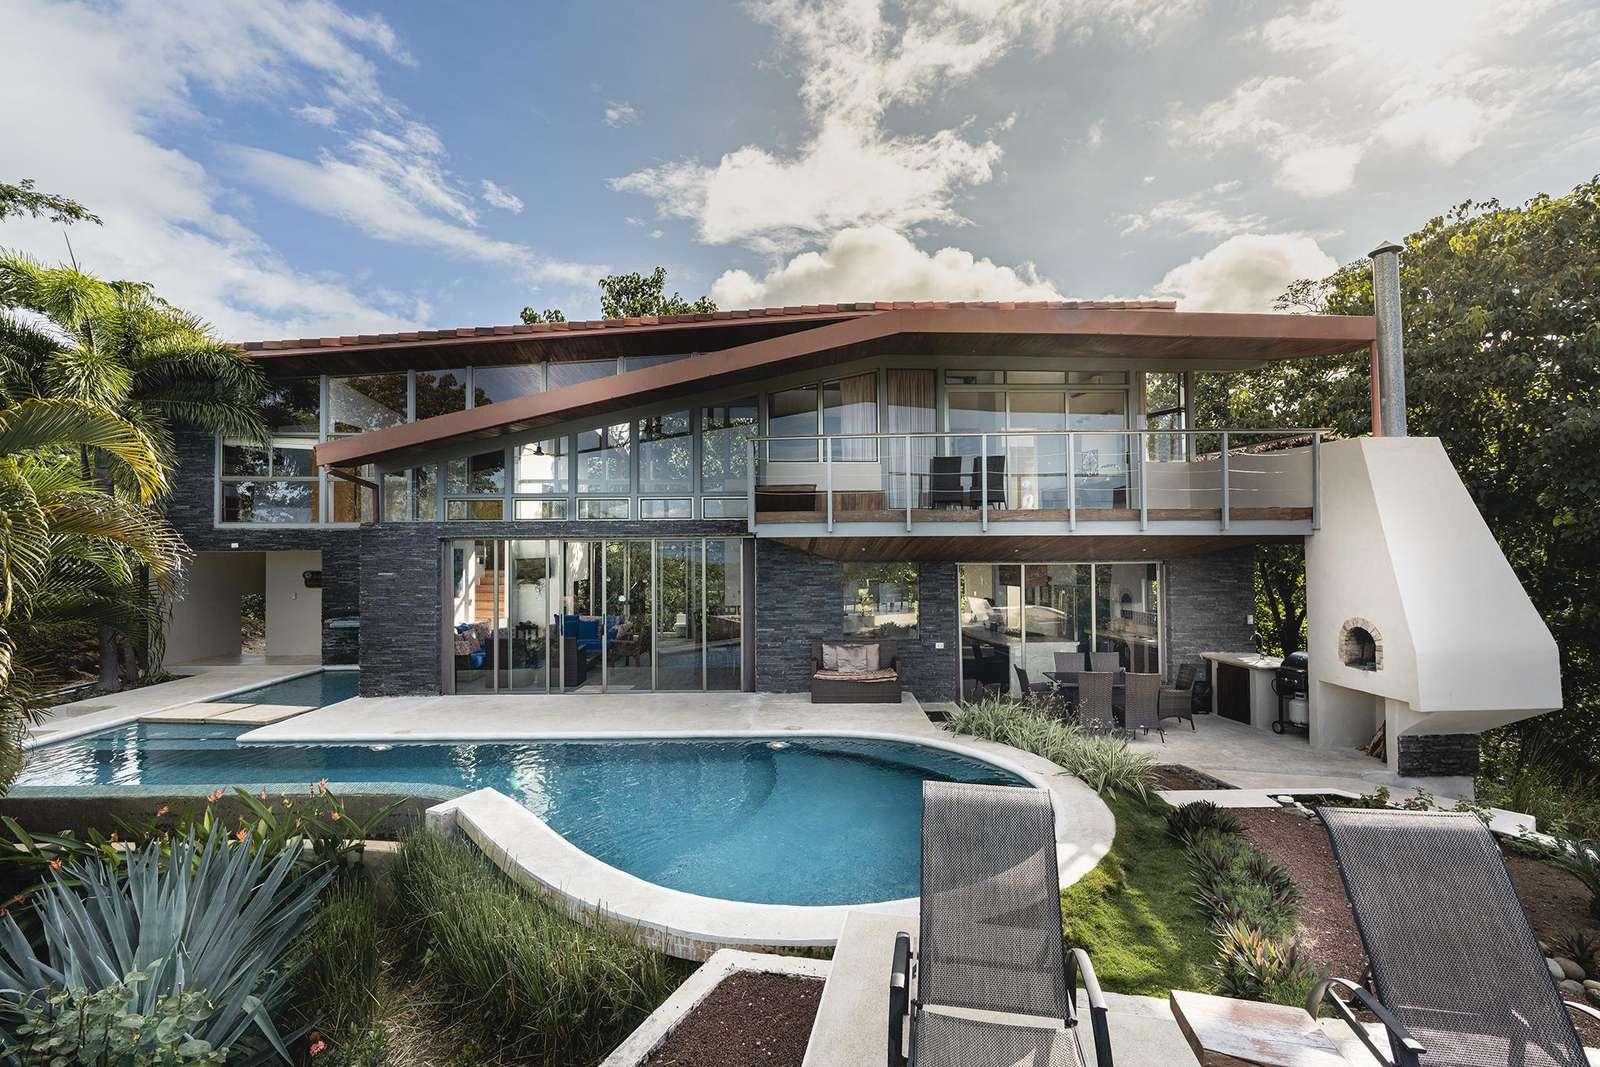 Casa Brisas del Mar, a modern 6 Bedroom home near Playa Conchal - property